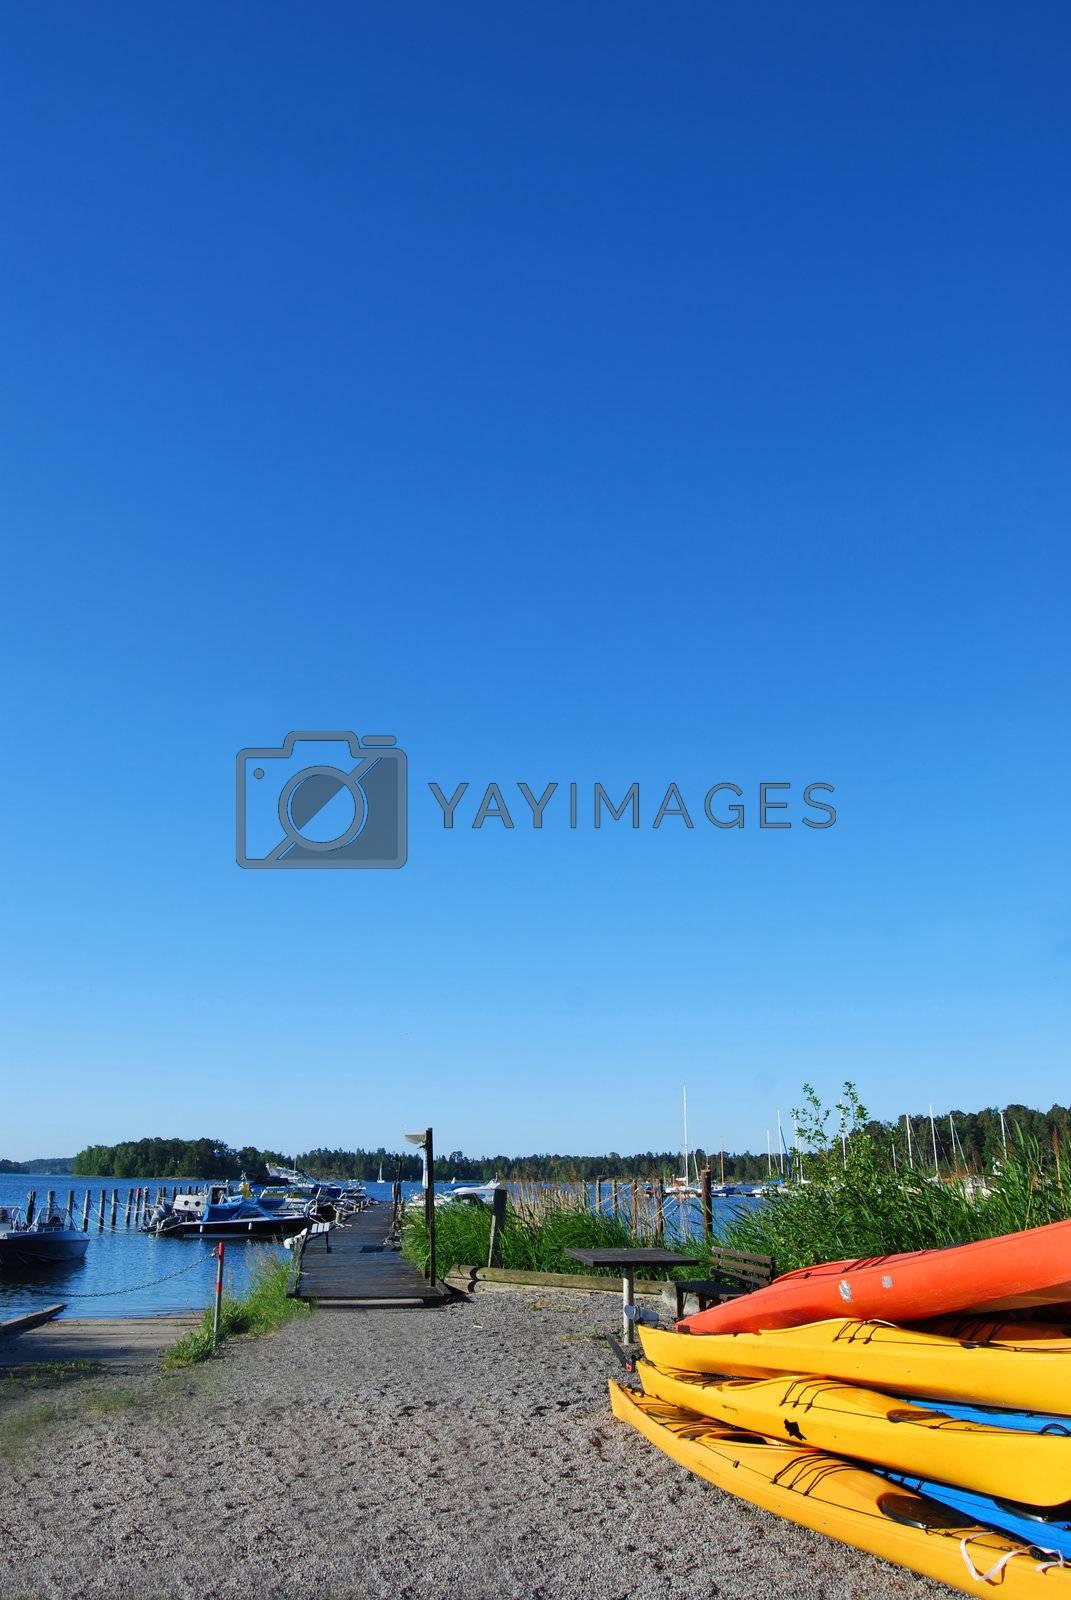 Summer in the scandinavian archipelago